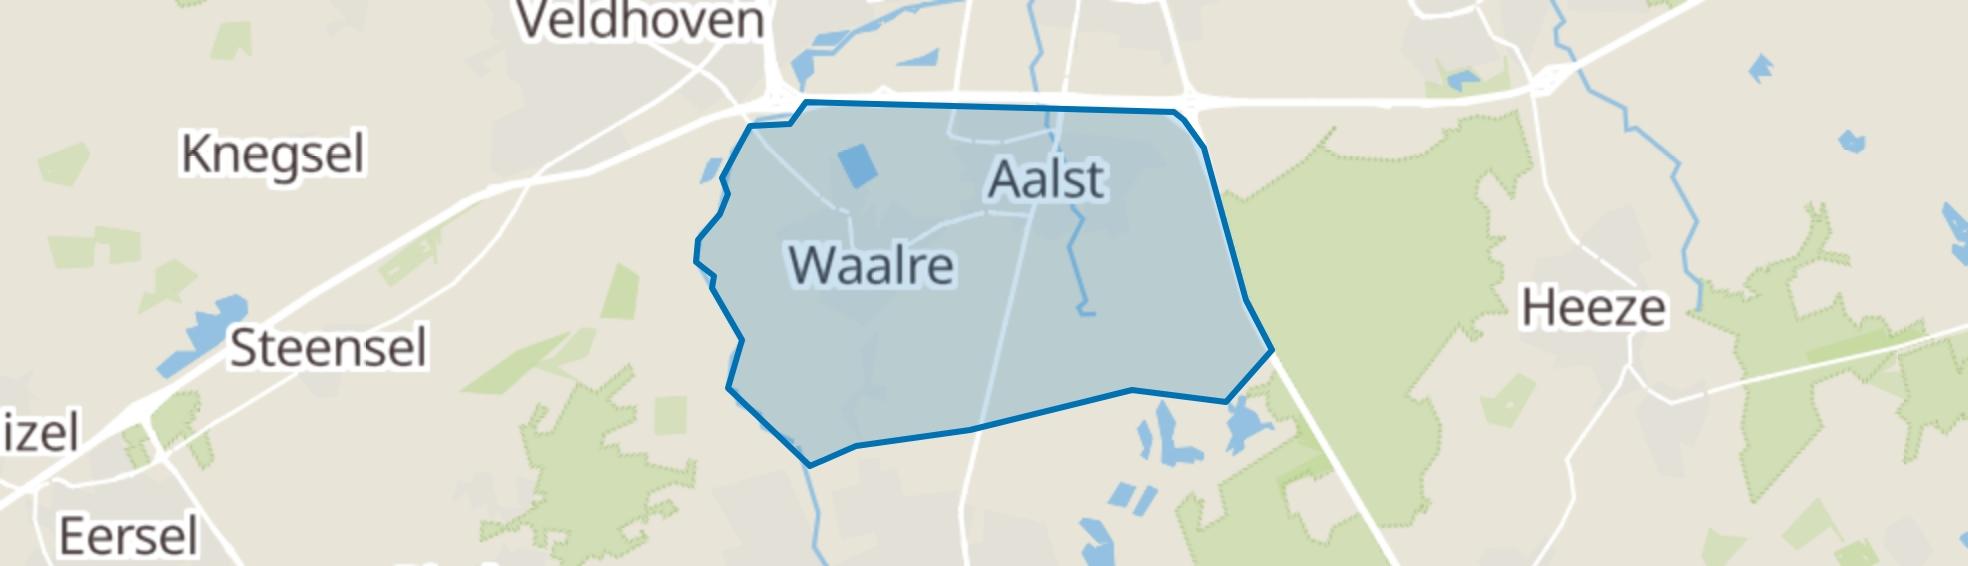 Waalre map